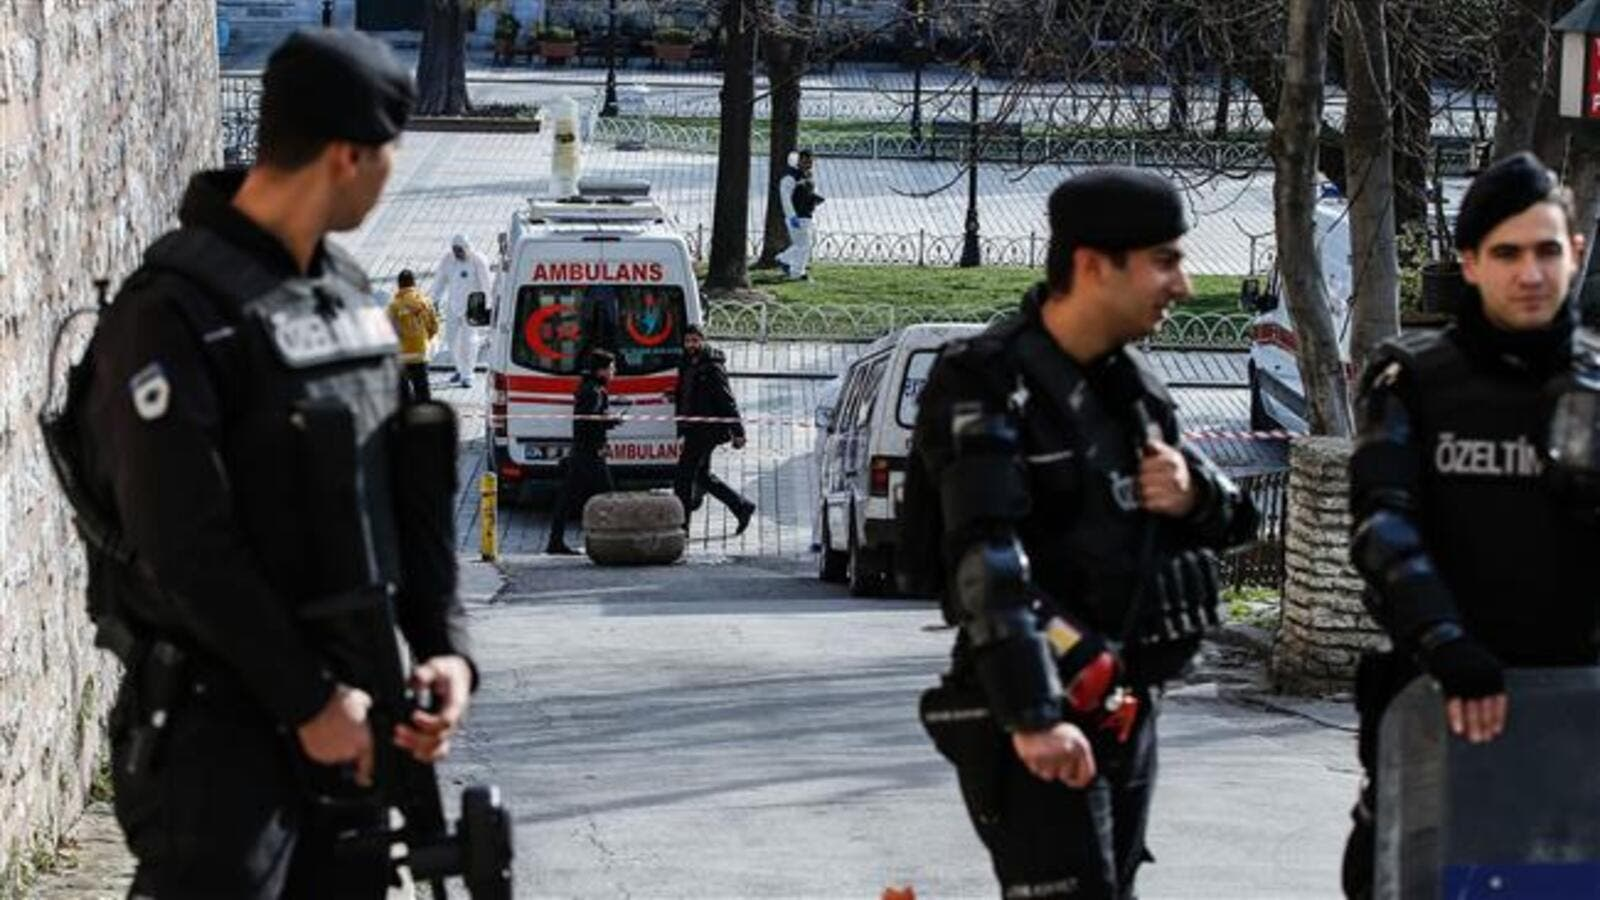 Turkey Hits Back at US Envoy's Remarks Tying it to Terrorism